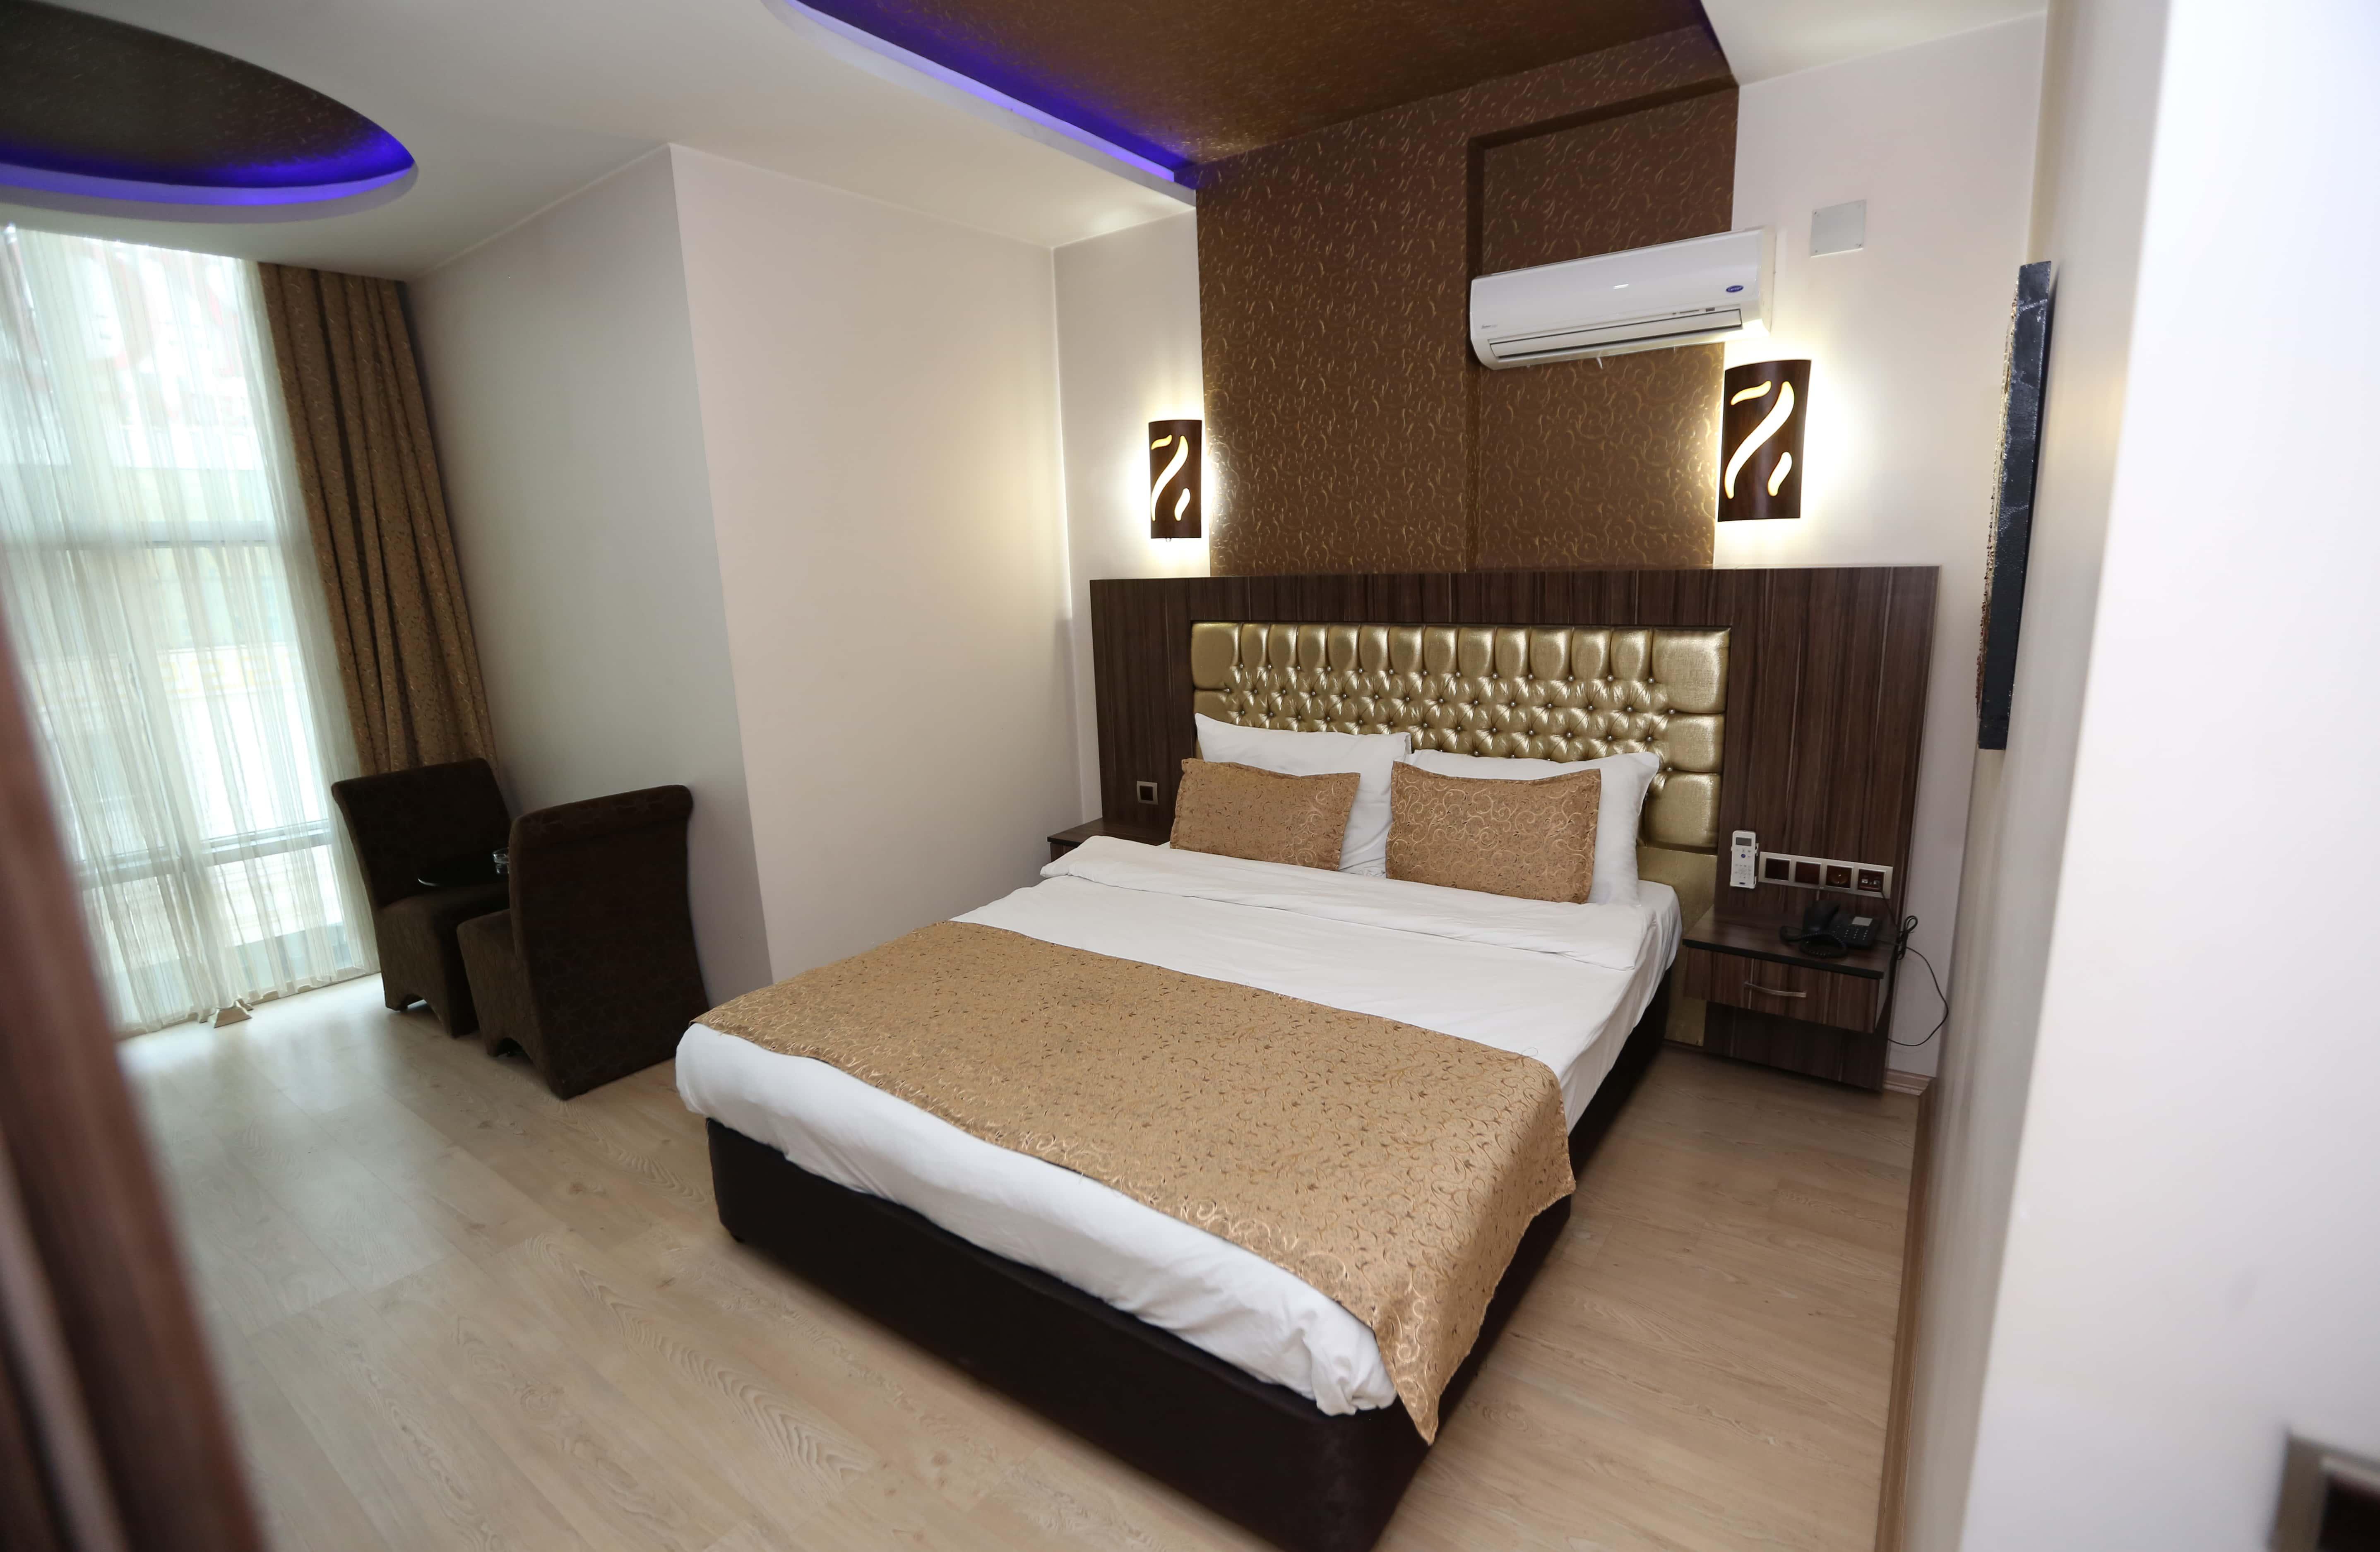 Lüks Hotel & Spa